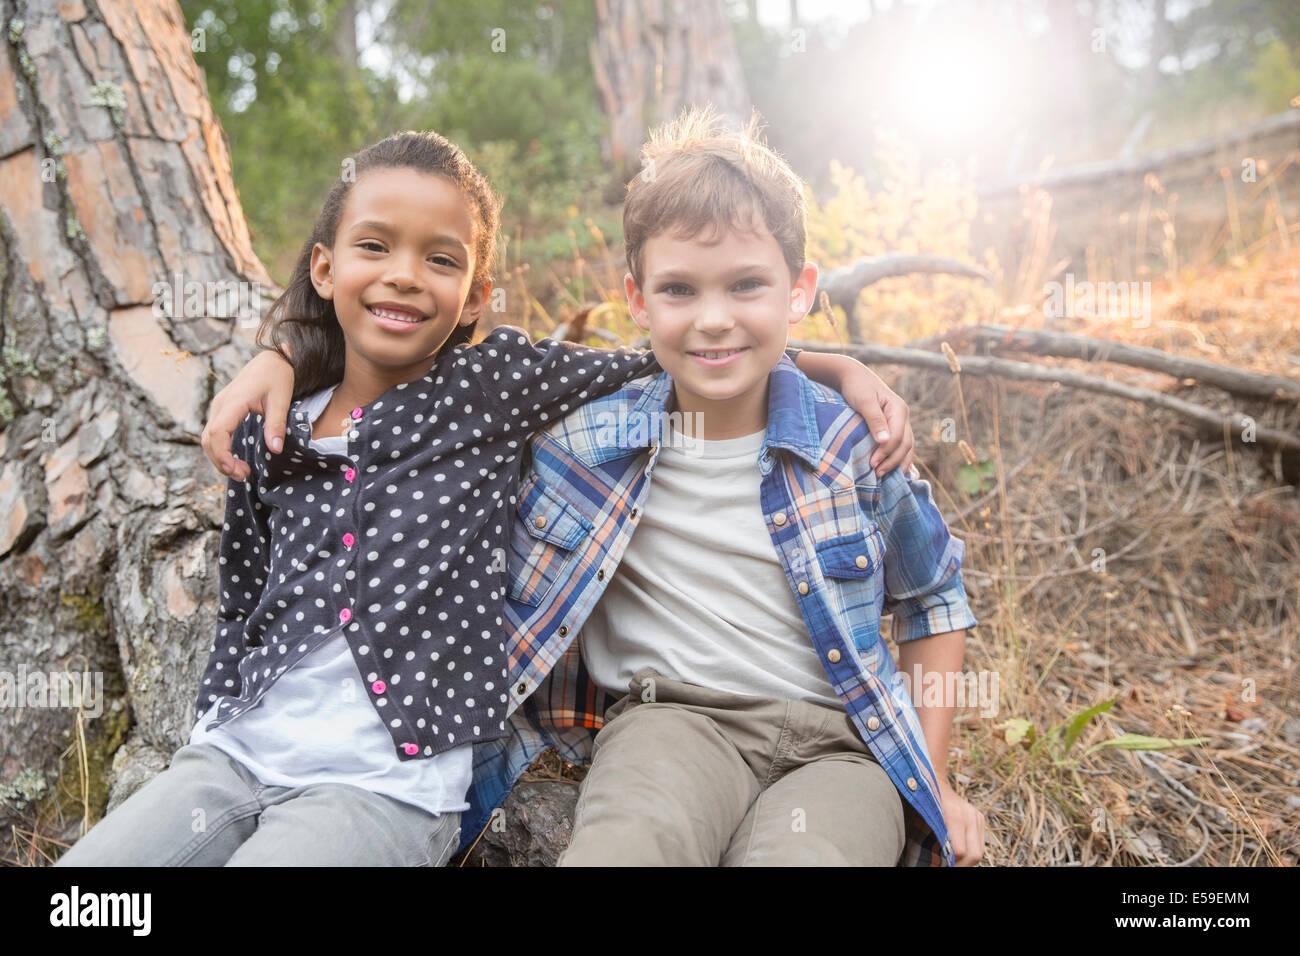 Bambini seduti insieme all'aperto Immagini Stock